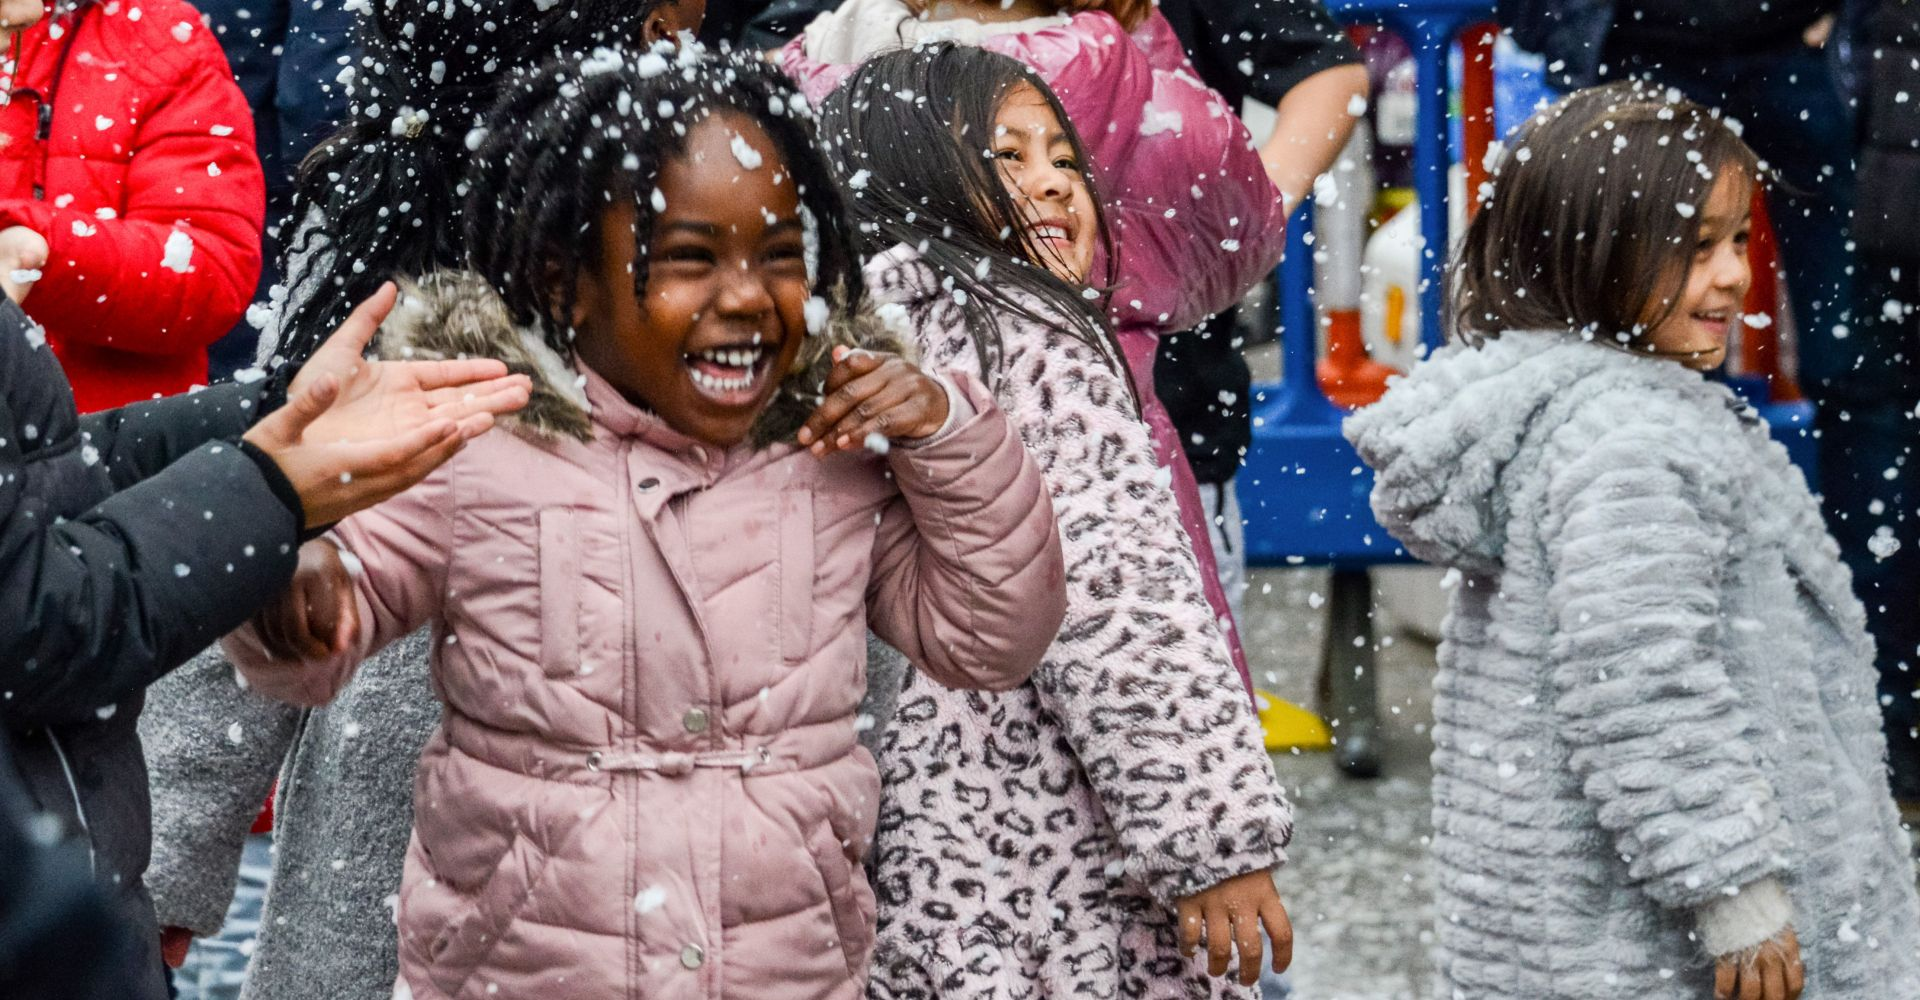 Join the Winter Carnival fun